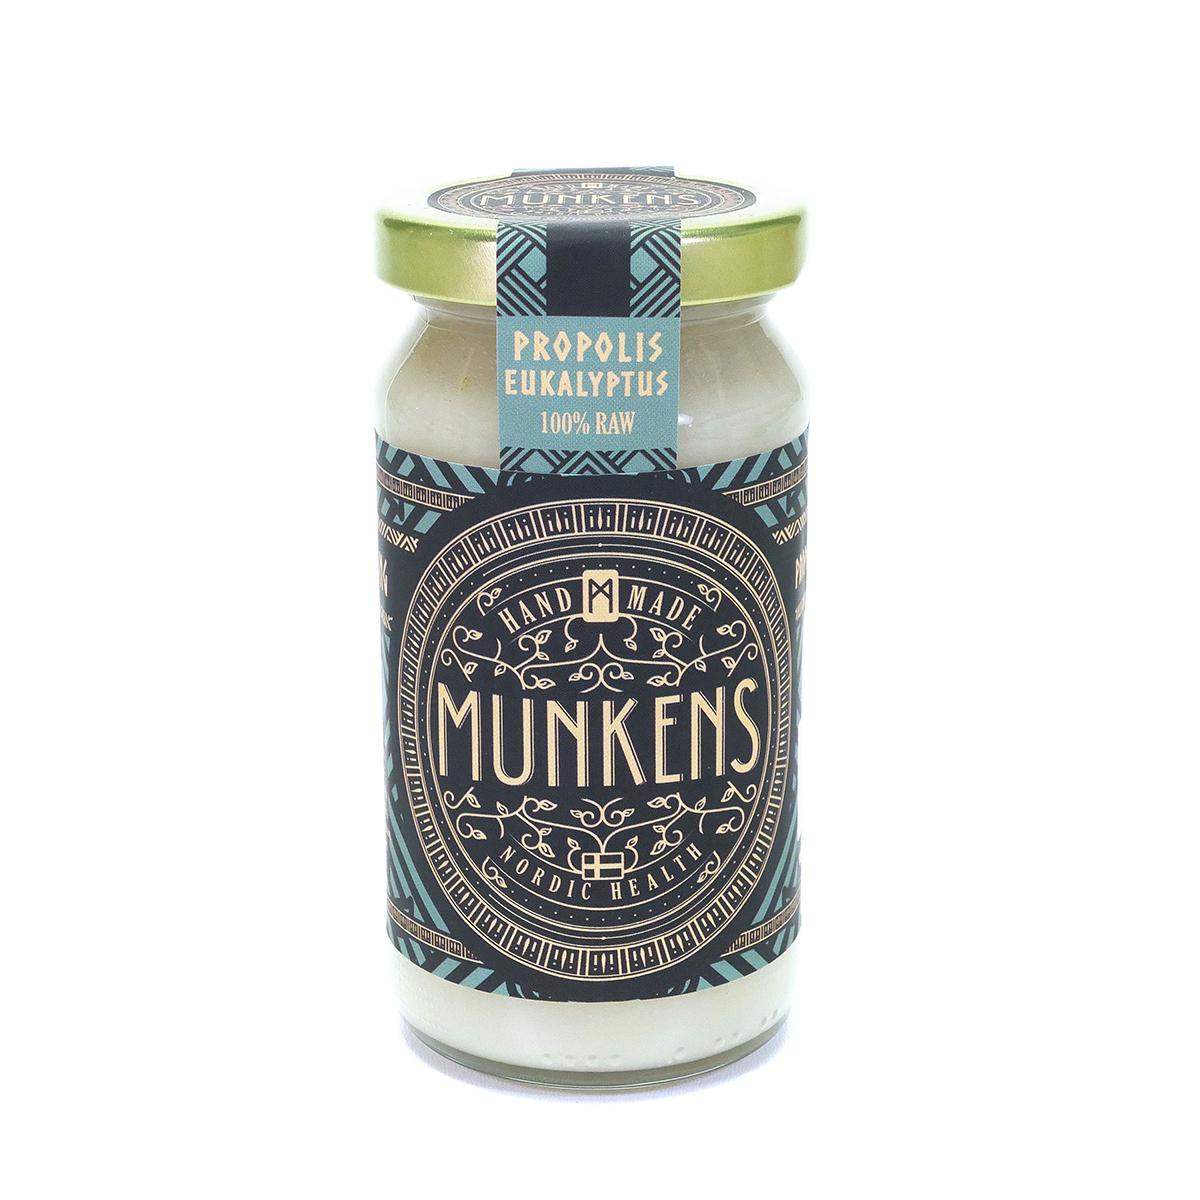 Munken_Svensk_Honung_Propolis_Eukalyptus_280g